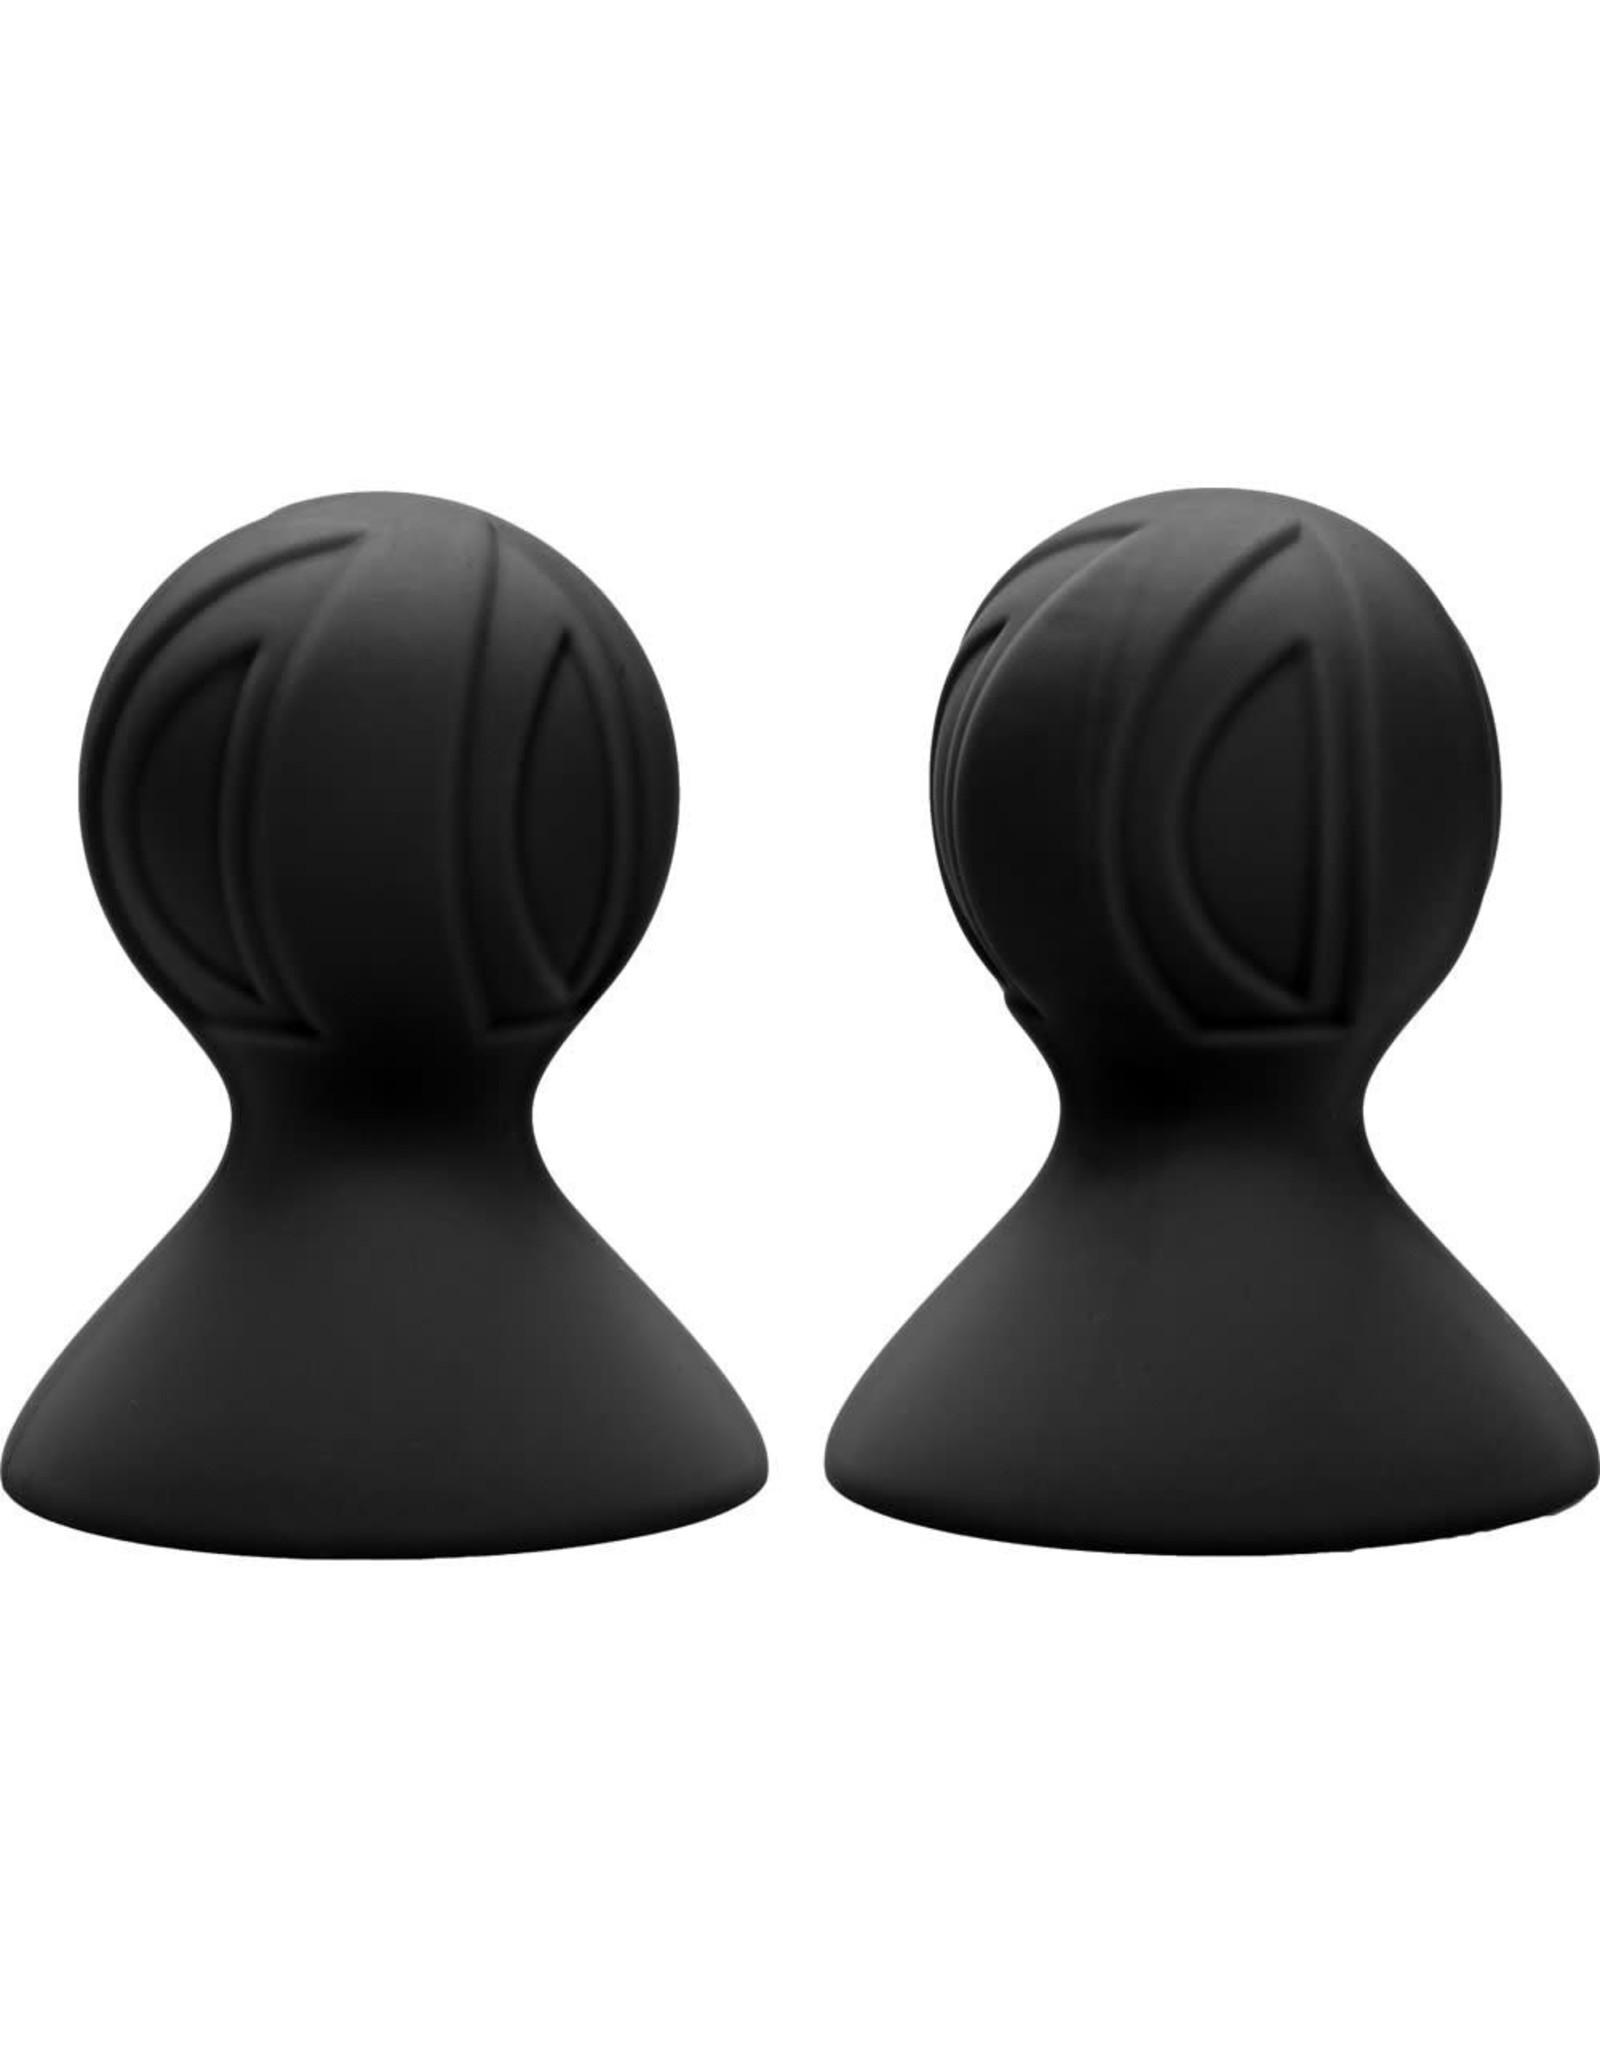 CALEXOTICS CALEXOTICS - NIPPLE PLAY - SILICONE PRO NIPPLE SUCKERS - BLACK